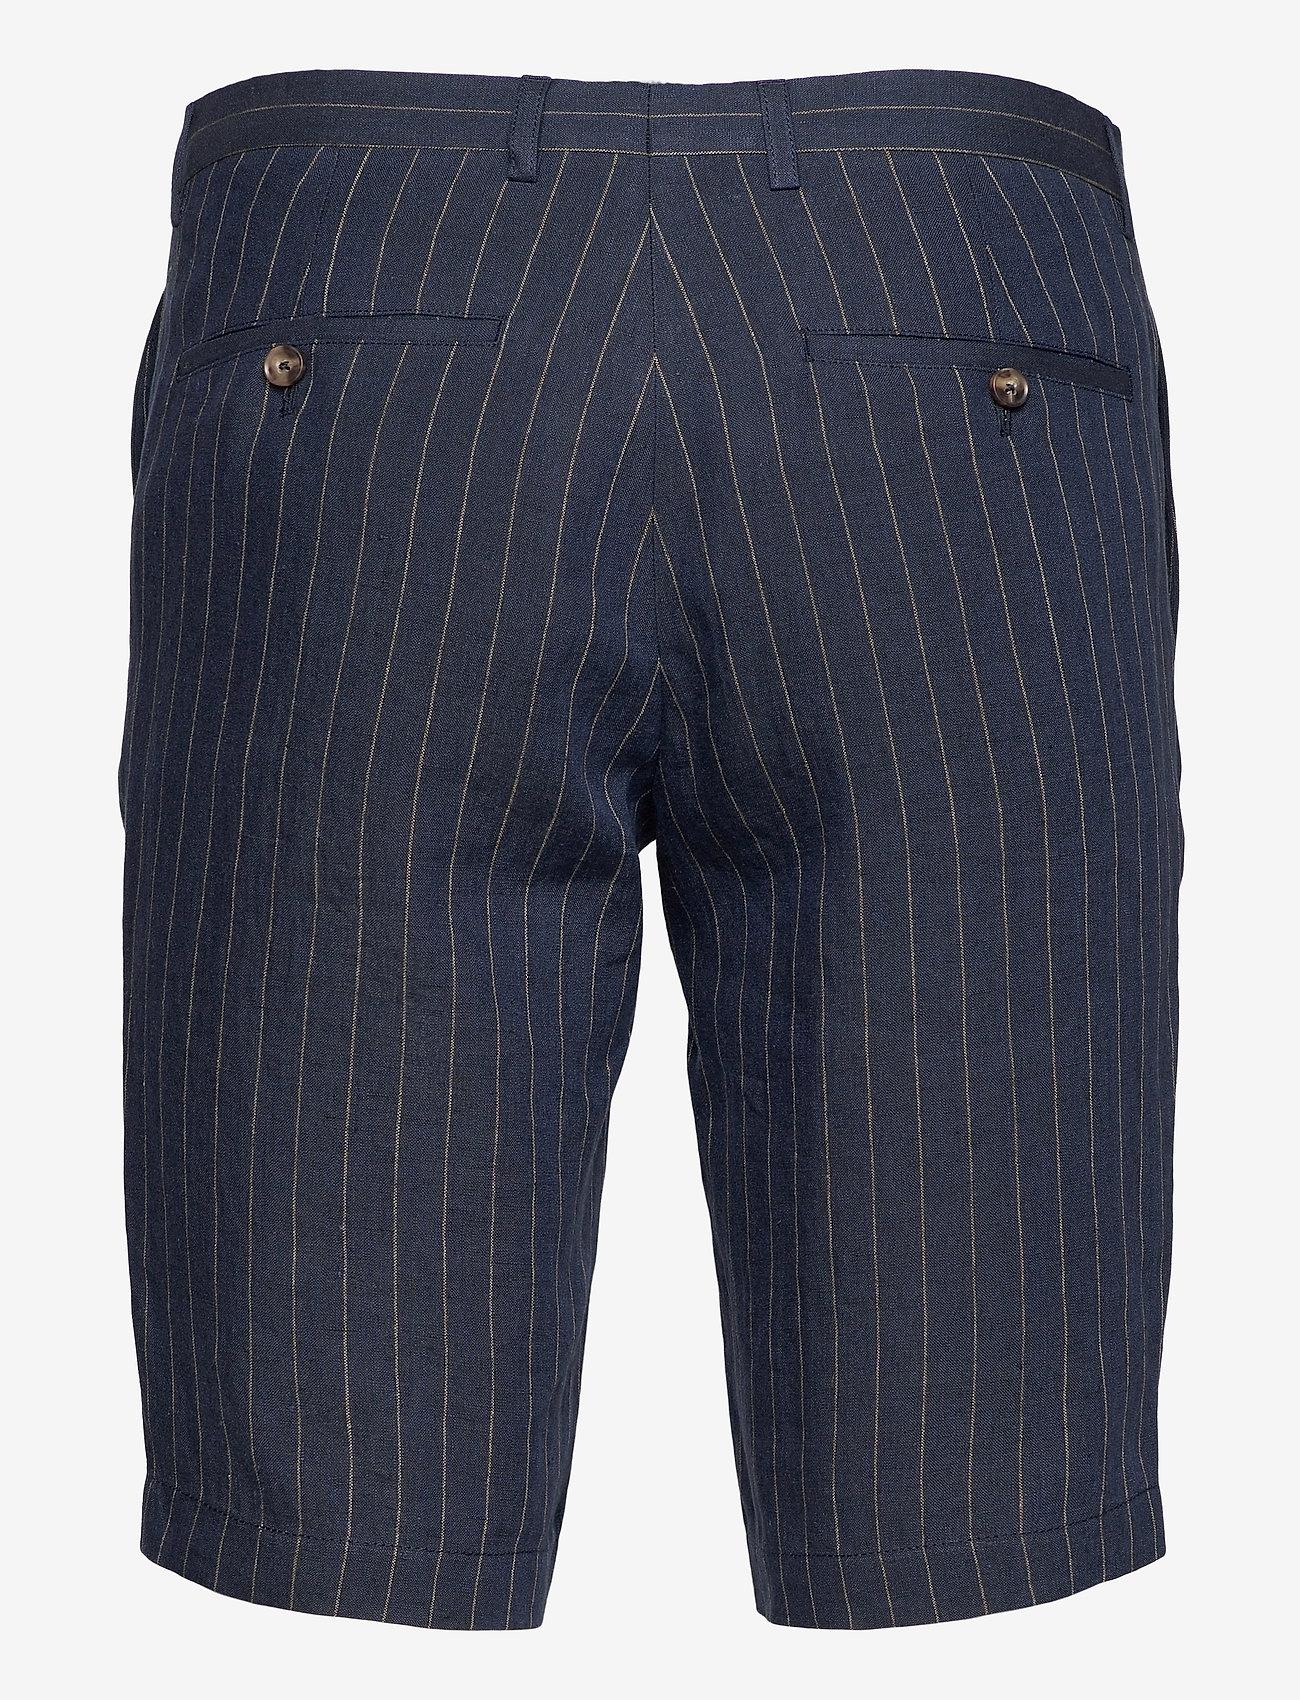 SAND - 1838 - Craig Short - casual shorts - dark blue/navy - 1